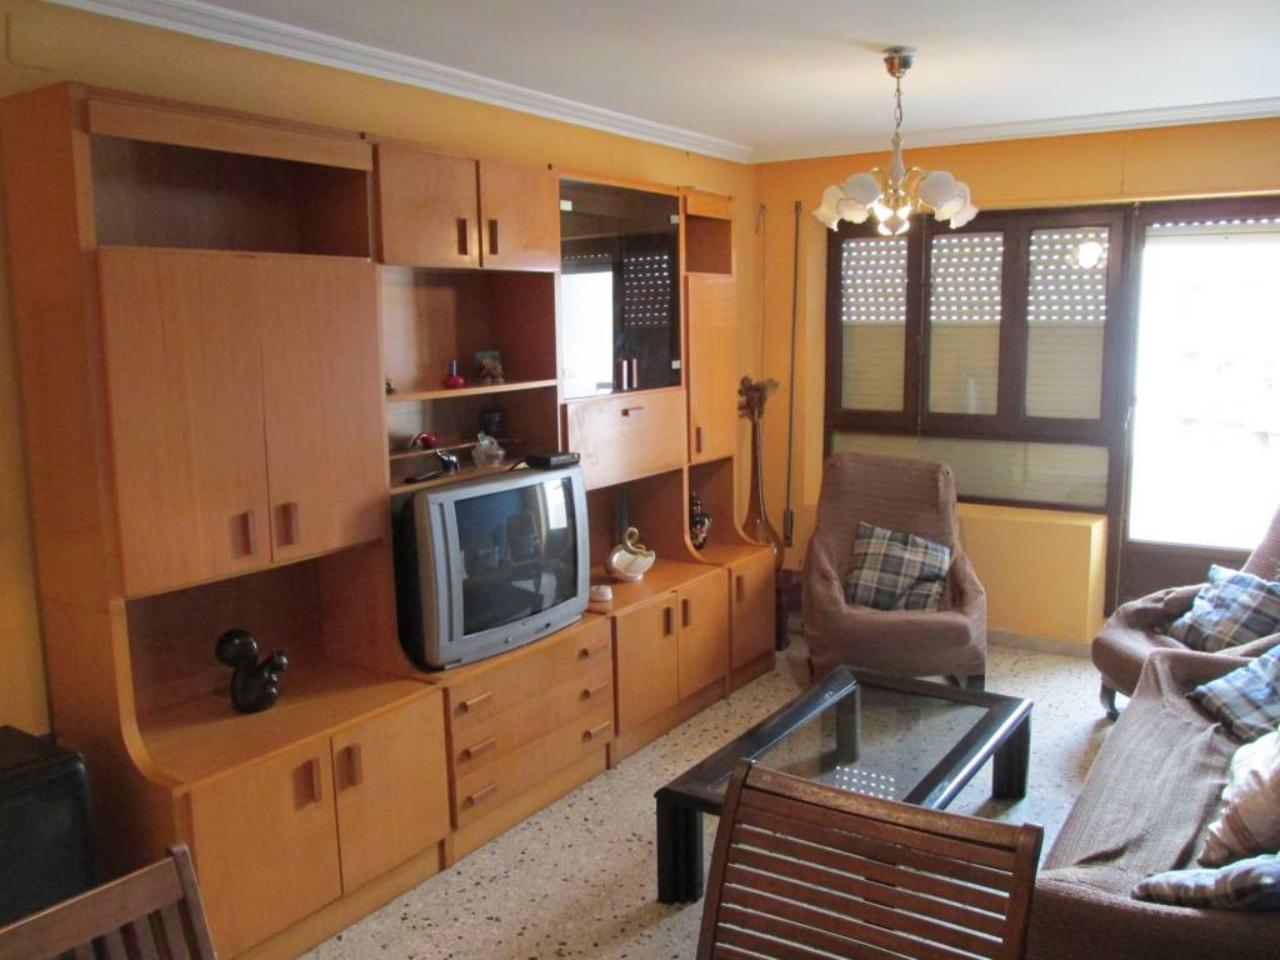 Muebles Verdu Ibi - Kasa 10 Inmobiliaria Piso En Venta En Ibi Por 60 000 02257[mjhdah]https://fotos.imghs.net/3xl/4433/4433_002257_foto_2_659936456_20160707184516.jpg